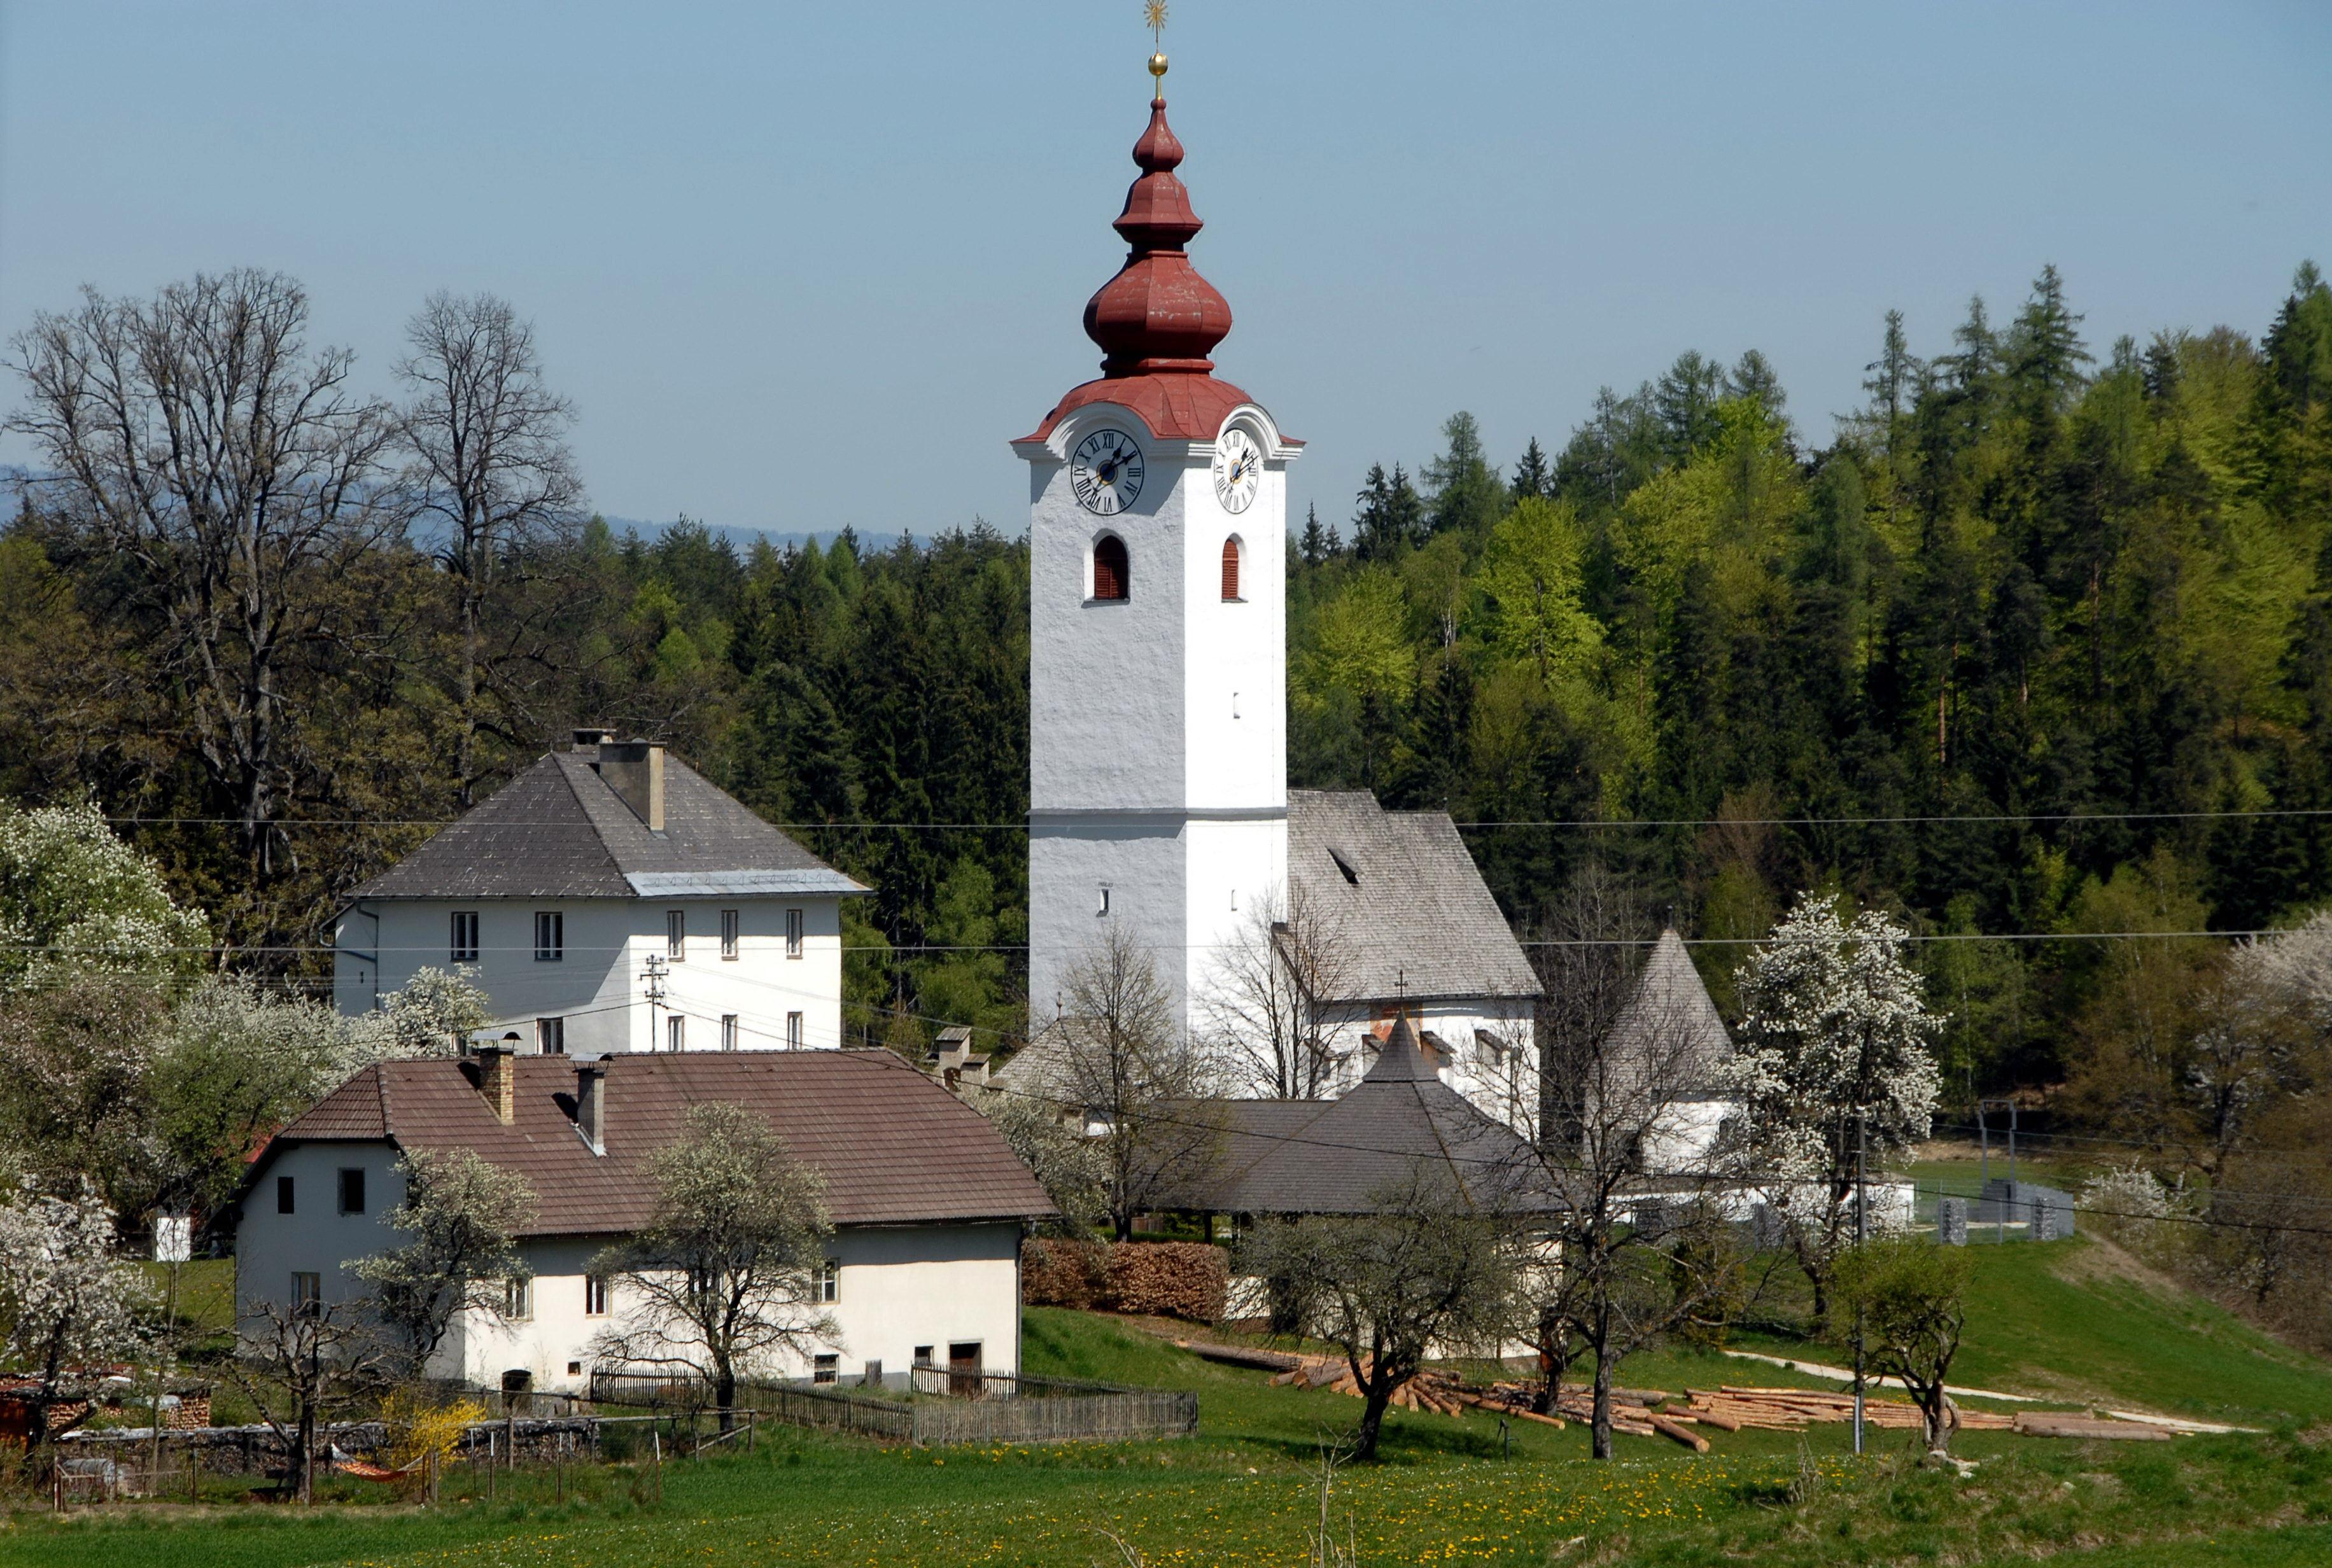 Rechnungsabschluss Ebenthal in Krnten 2016 (Statistik